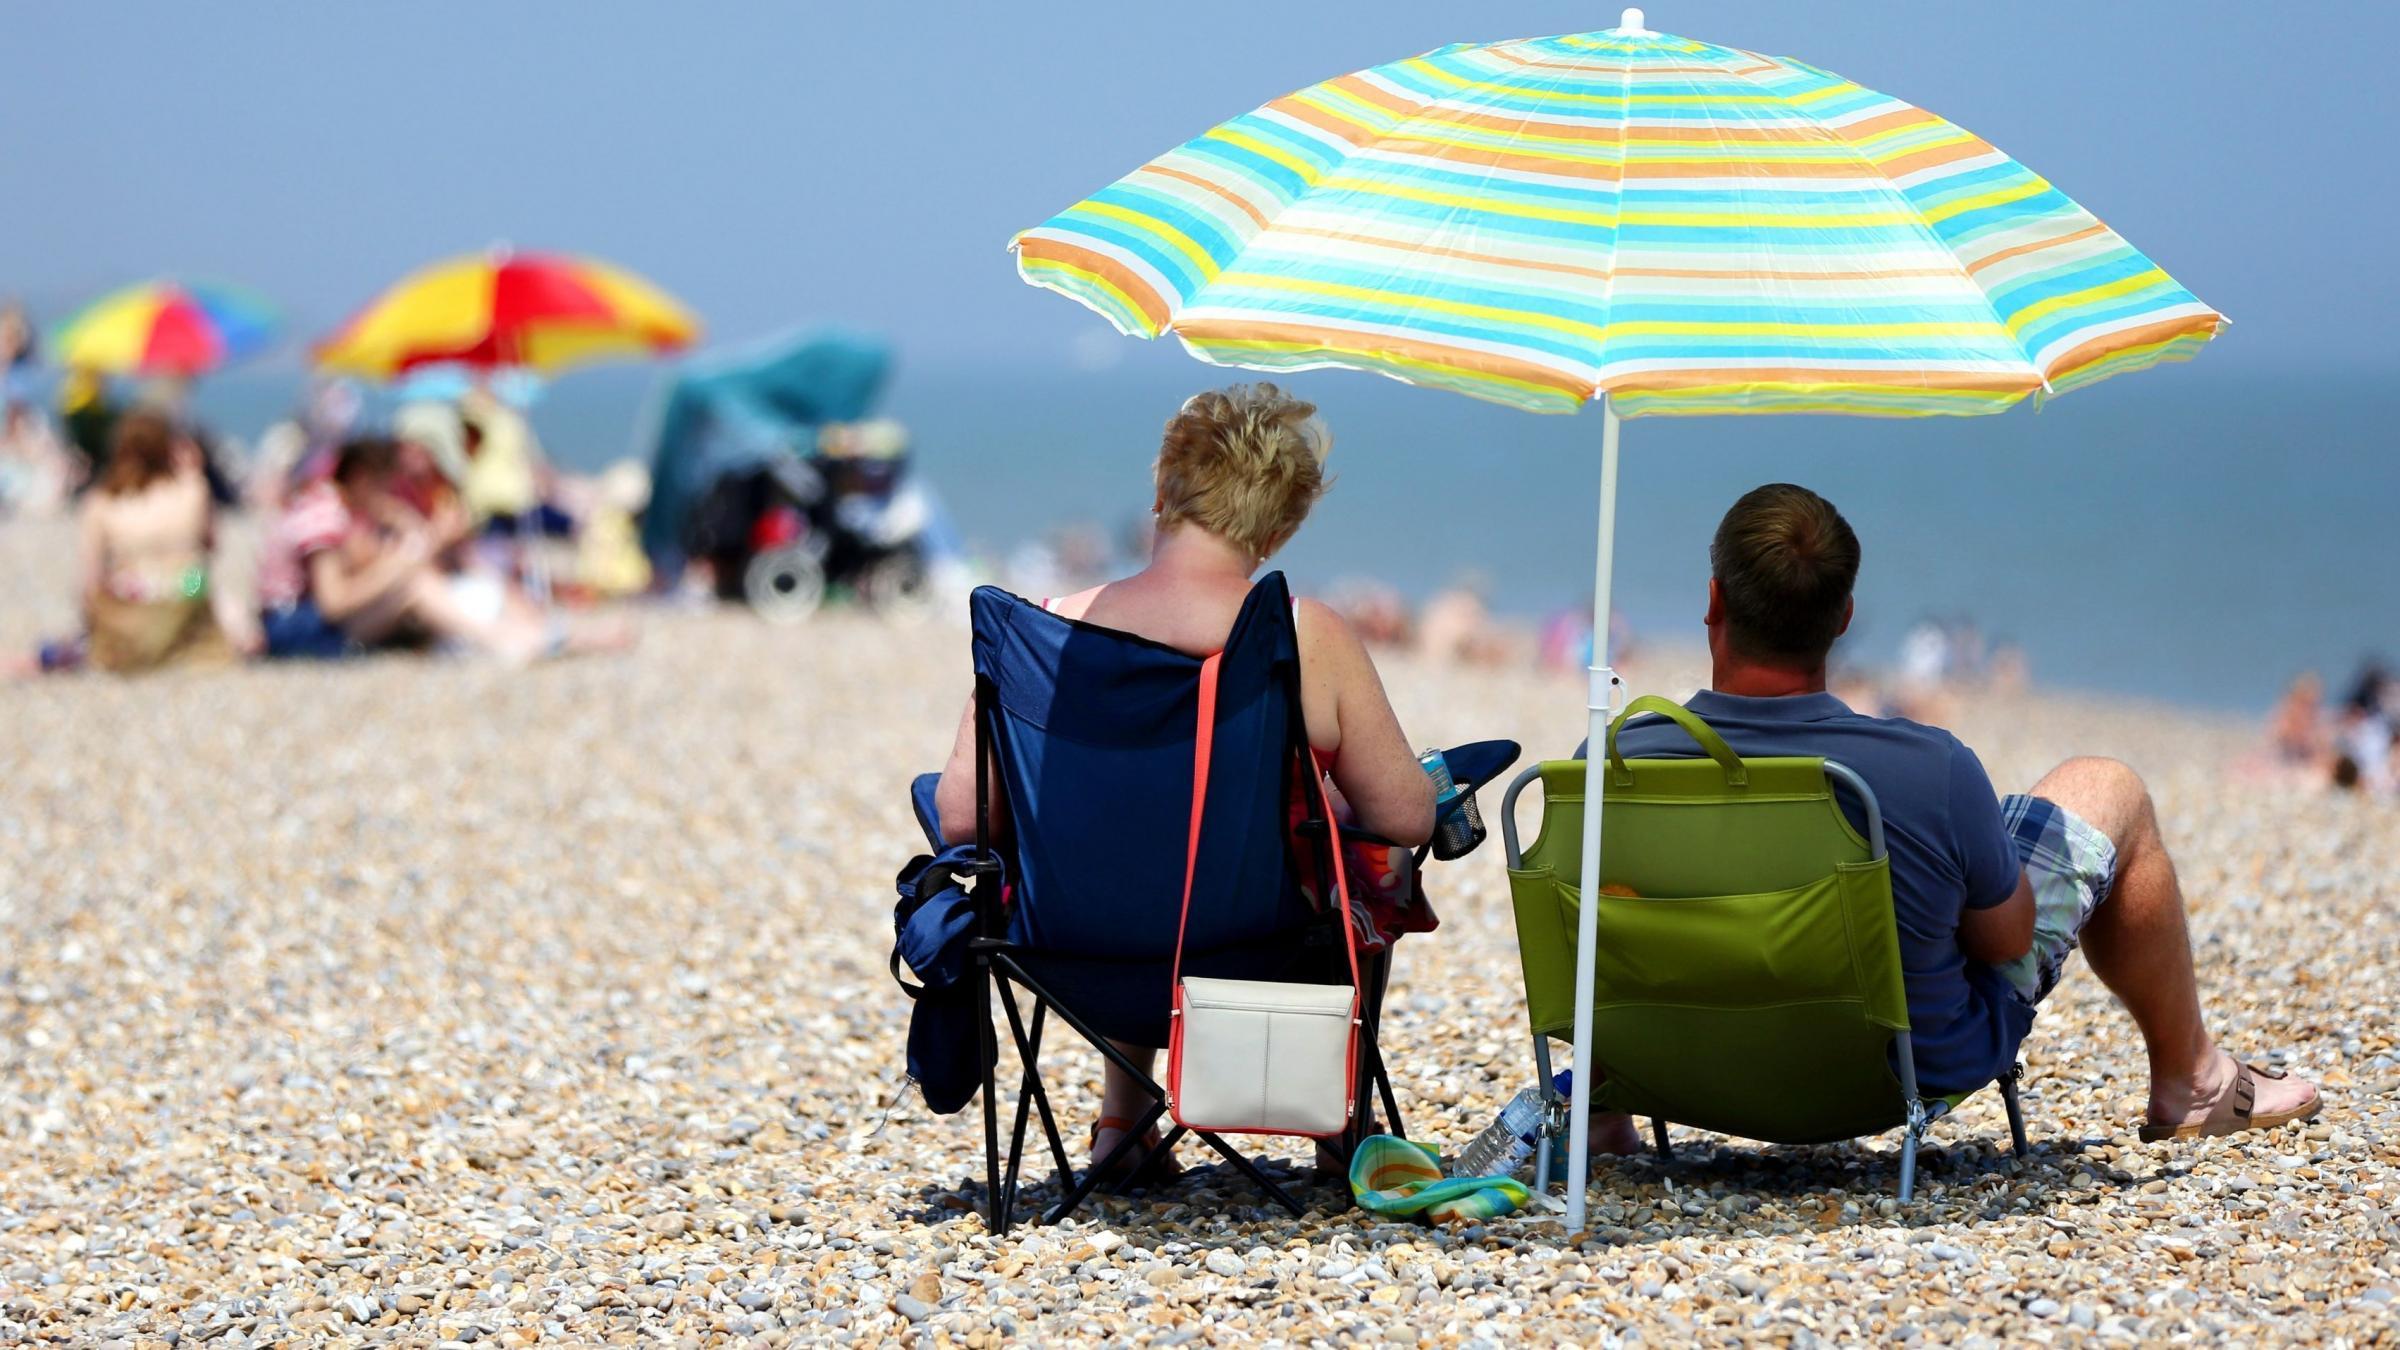 Mercury rises as Met office issues second highest heatwave alert